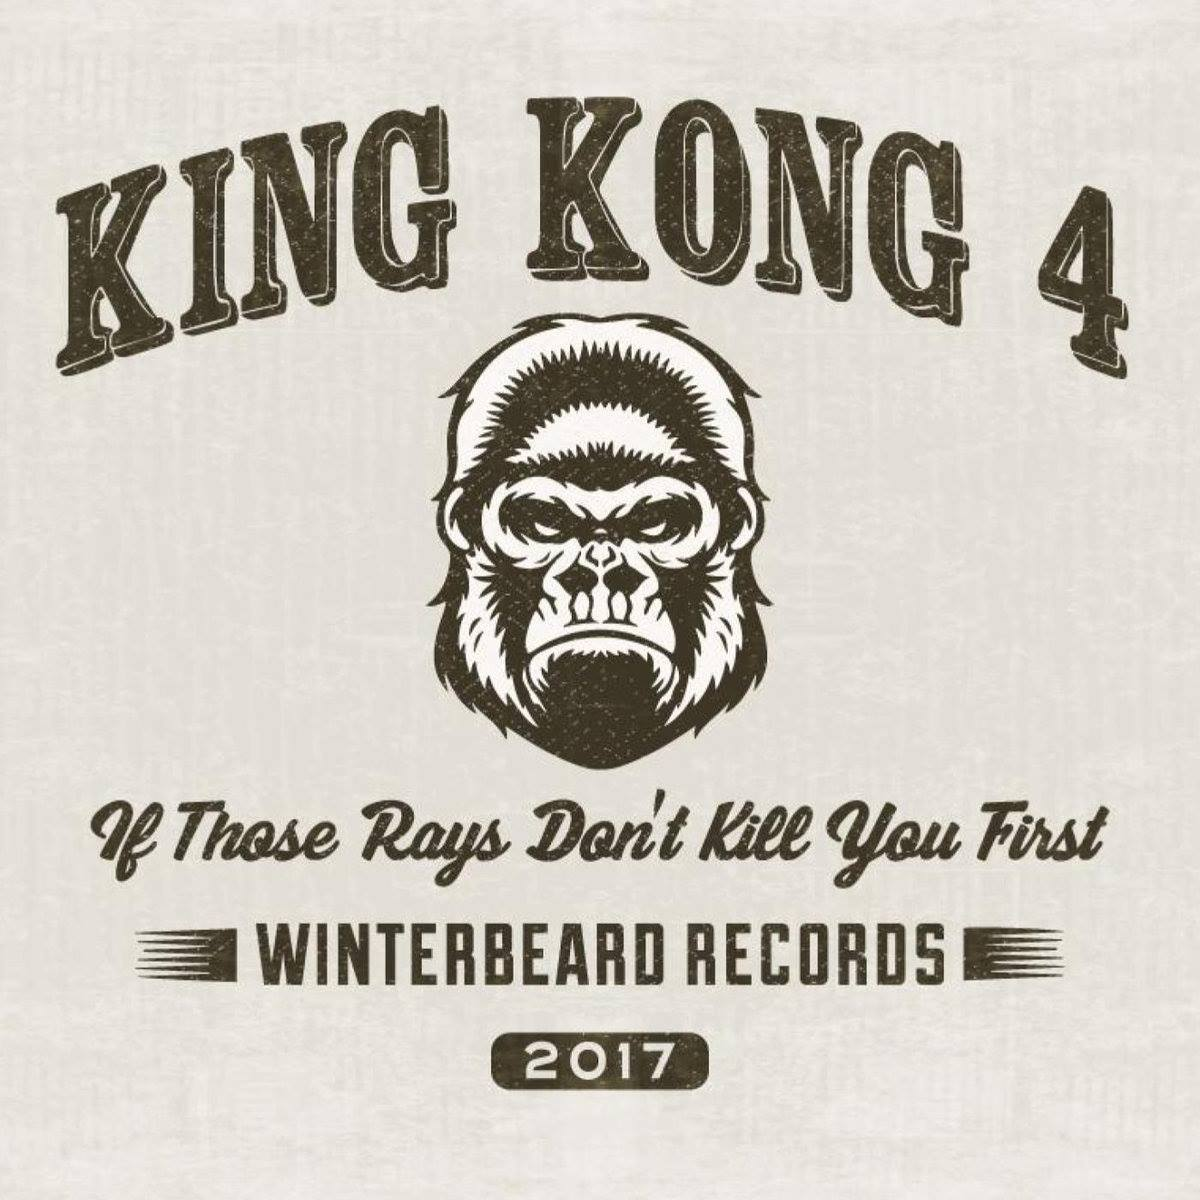 Classy Wrecks & King Kong 4